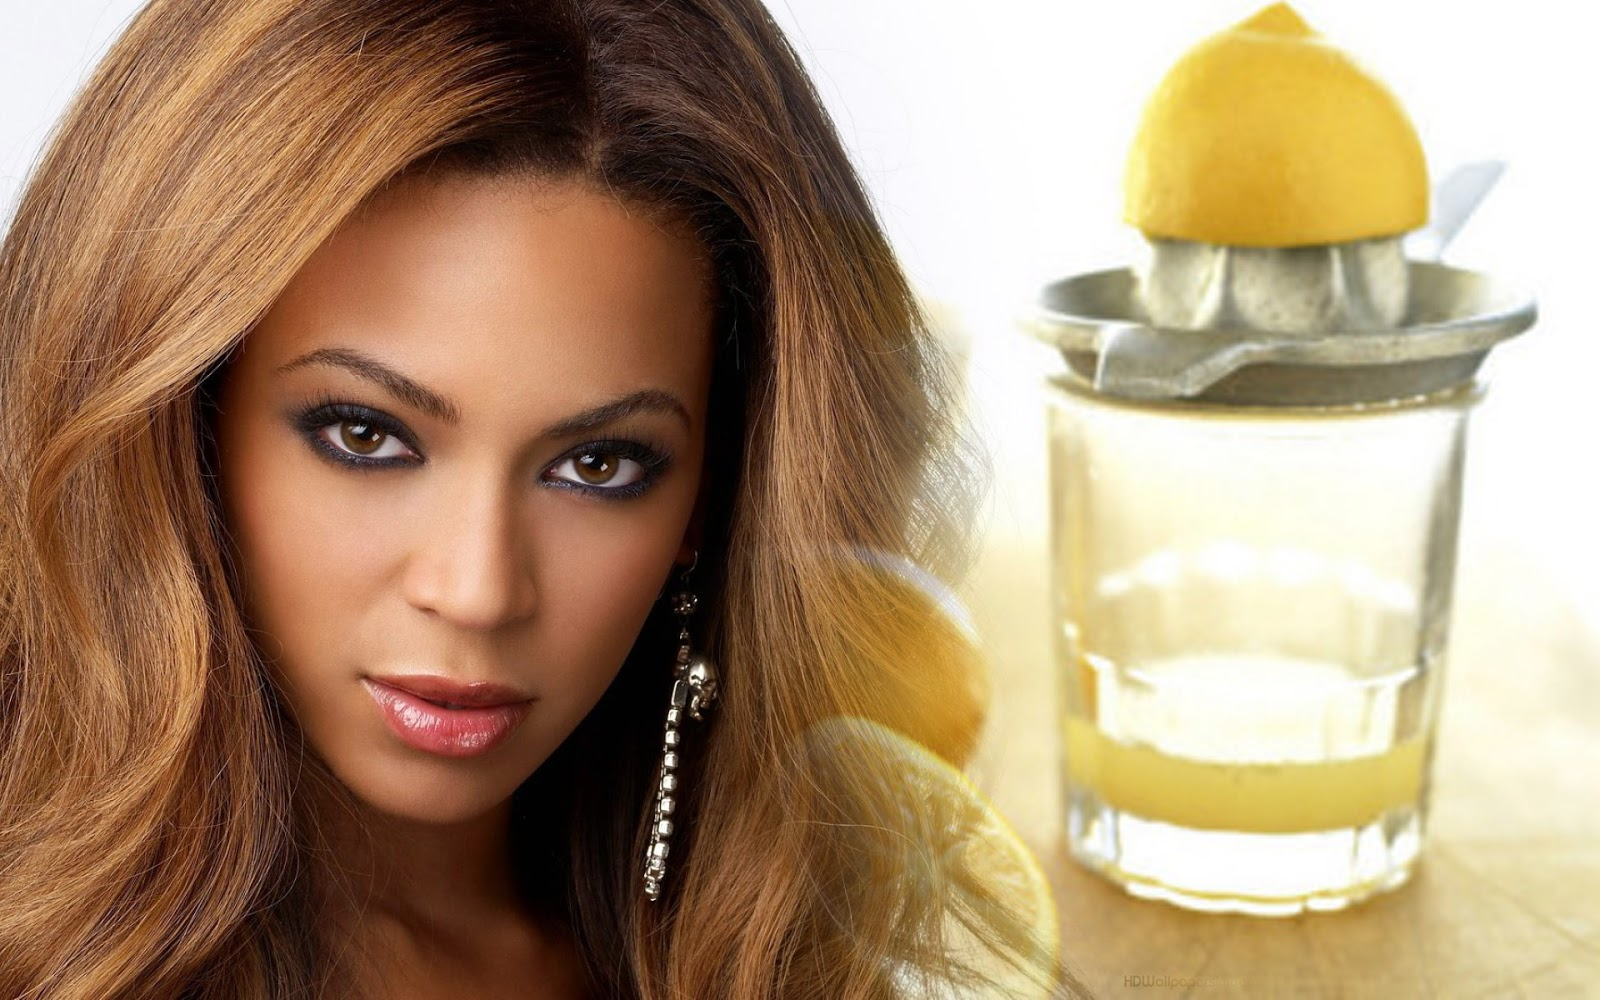 How To Make Lemon Detox Diet Up Your Live